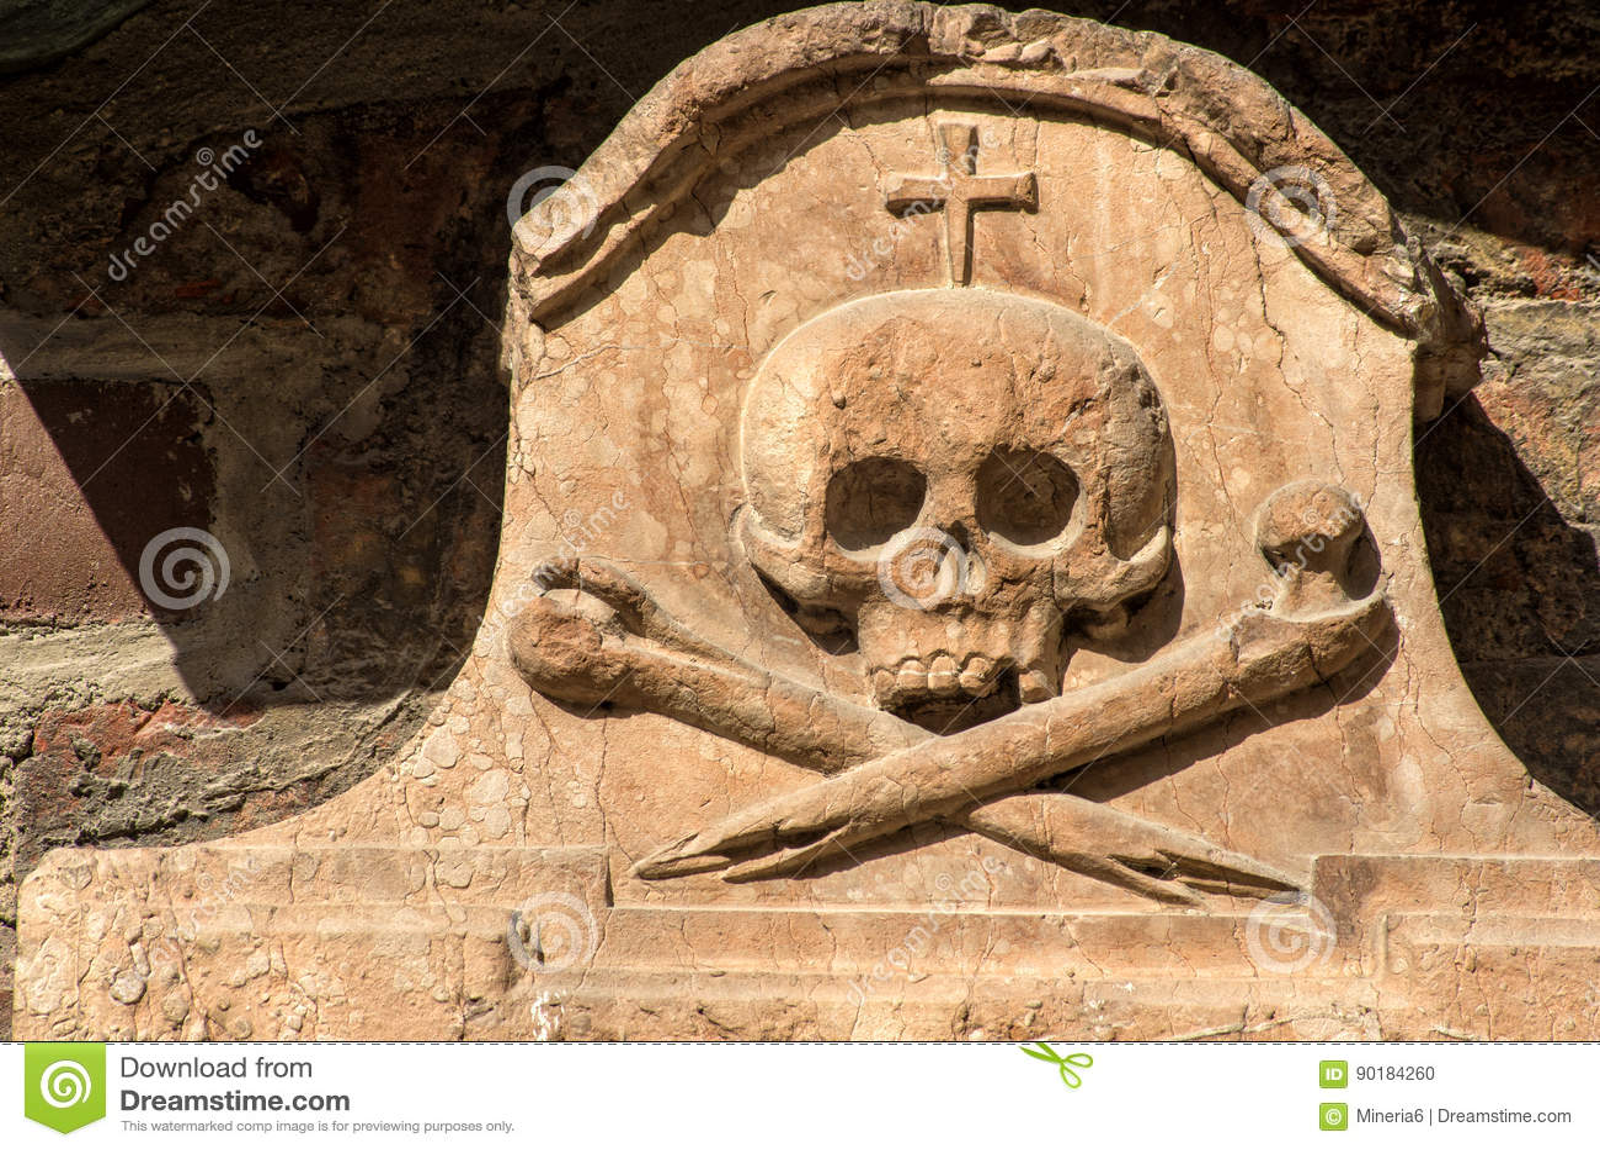 Stone skull stock photo  Image of funeral, human, religion - 90184260